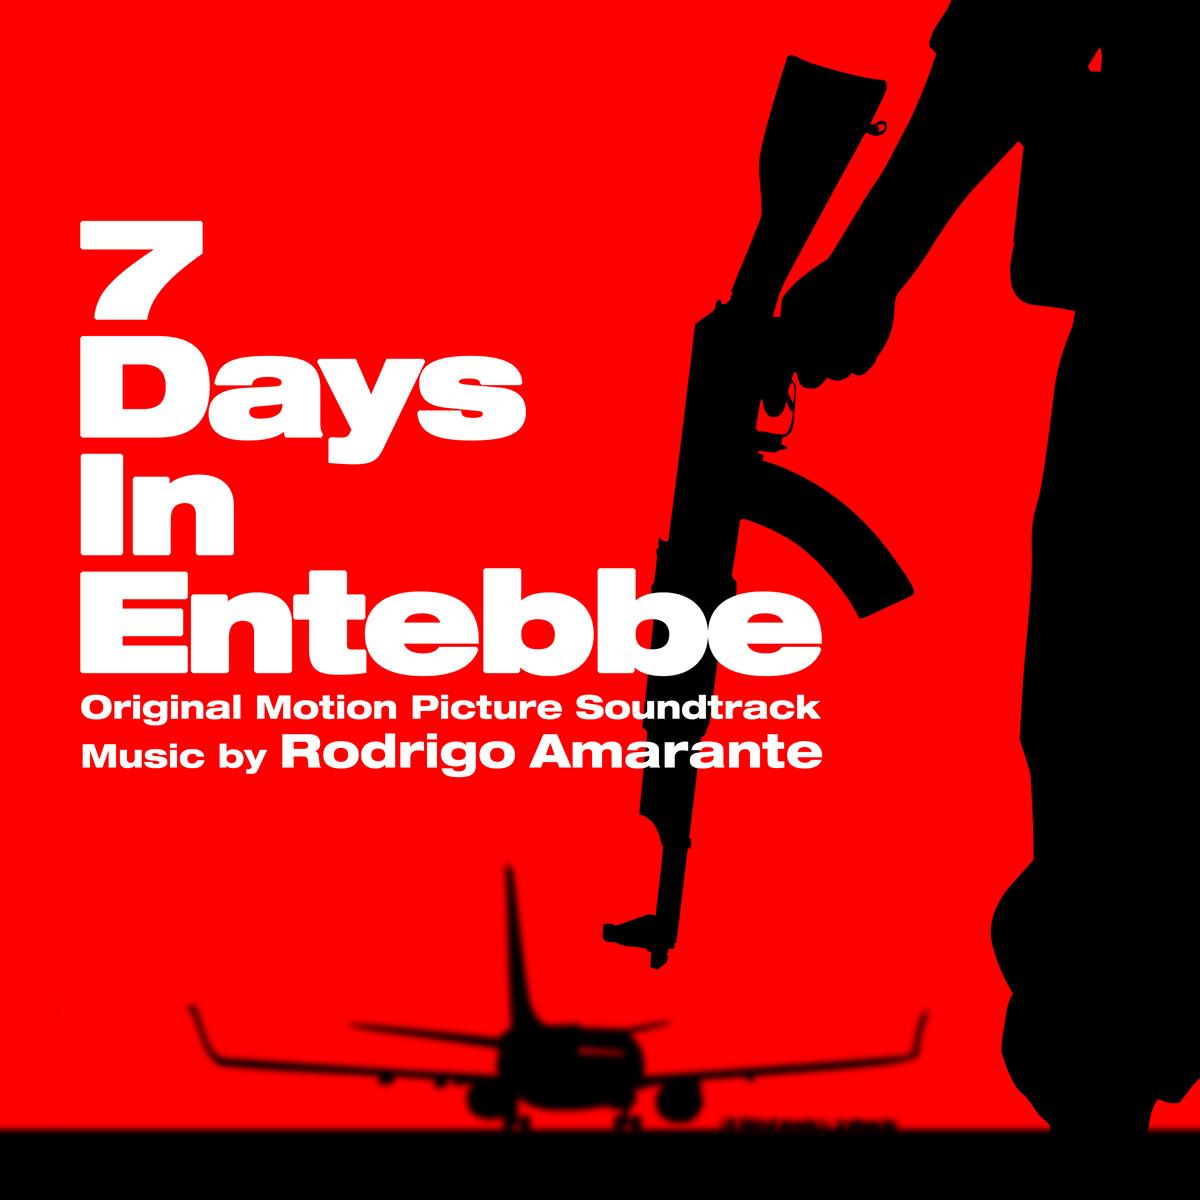 7 Days in Entebbe - Original Motion Picture Soundtrack - Rodrigo Amarante